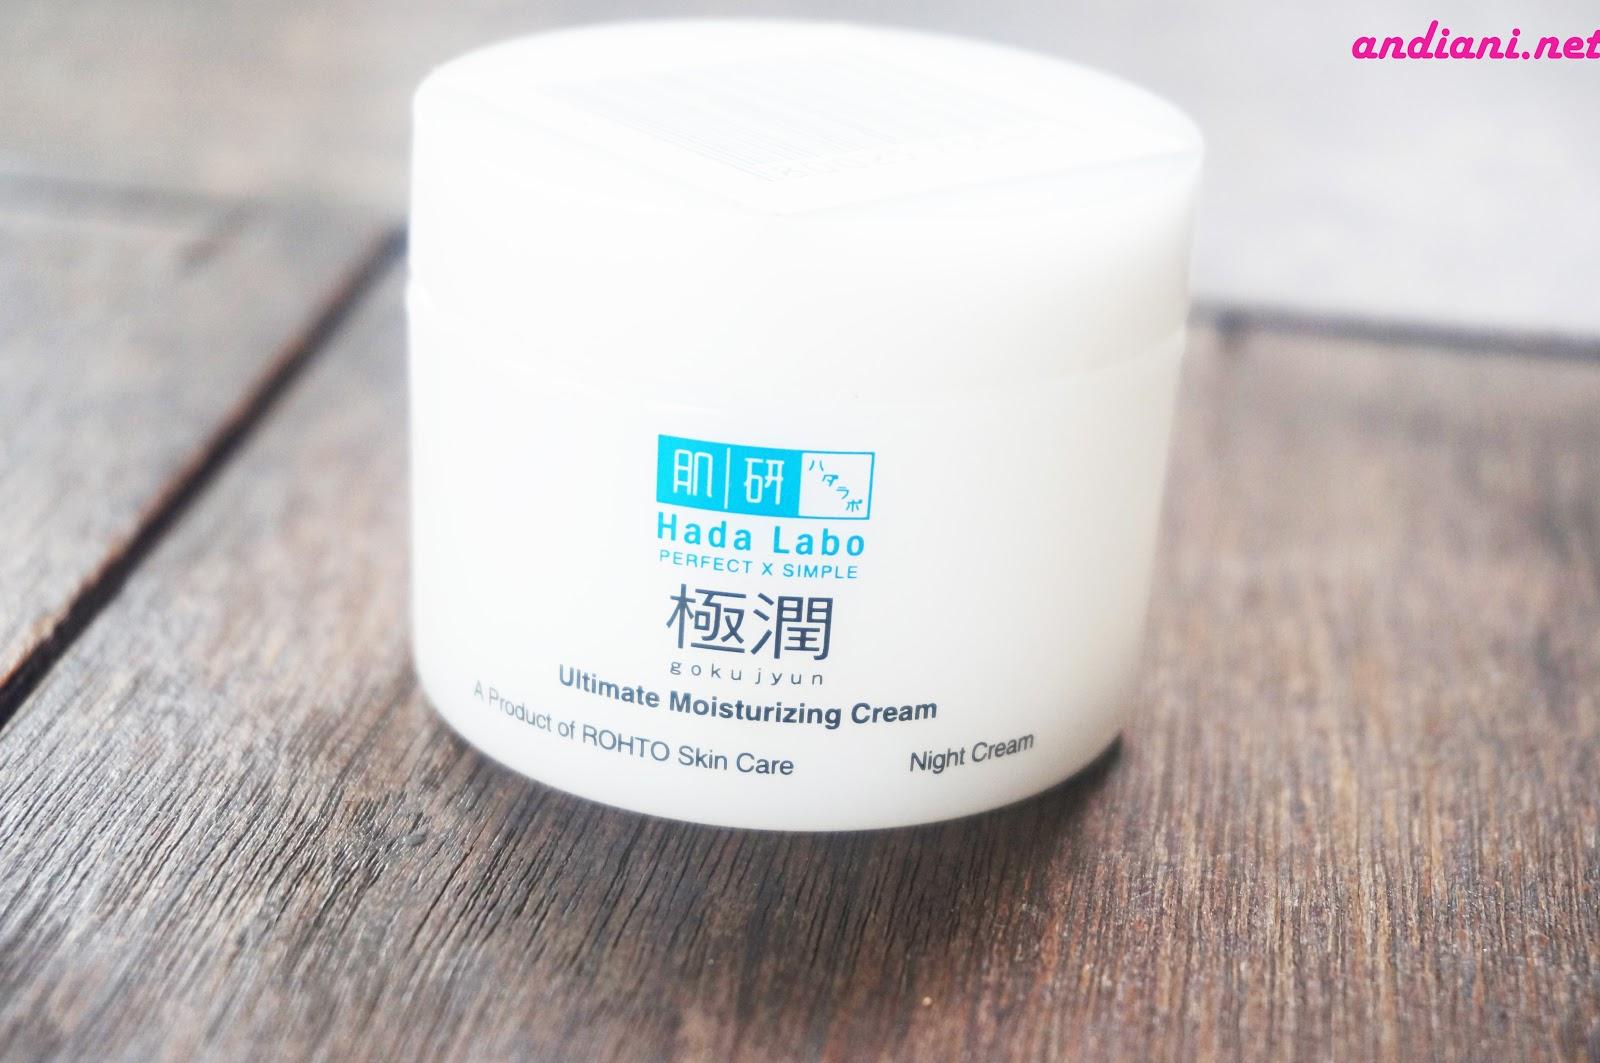 My Skincare Hadalabo Untuk Kulit Berminyak Andianis Beauty Hada Labo Gokujyun Starter Pack Pelembab Ultimate Moisturizing Cream